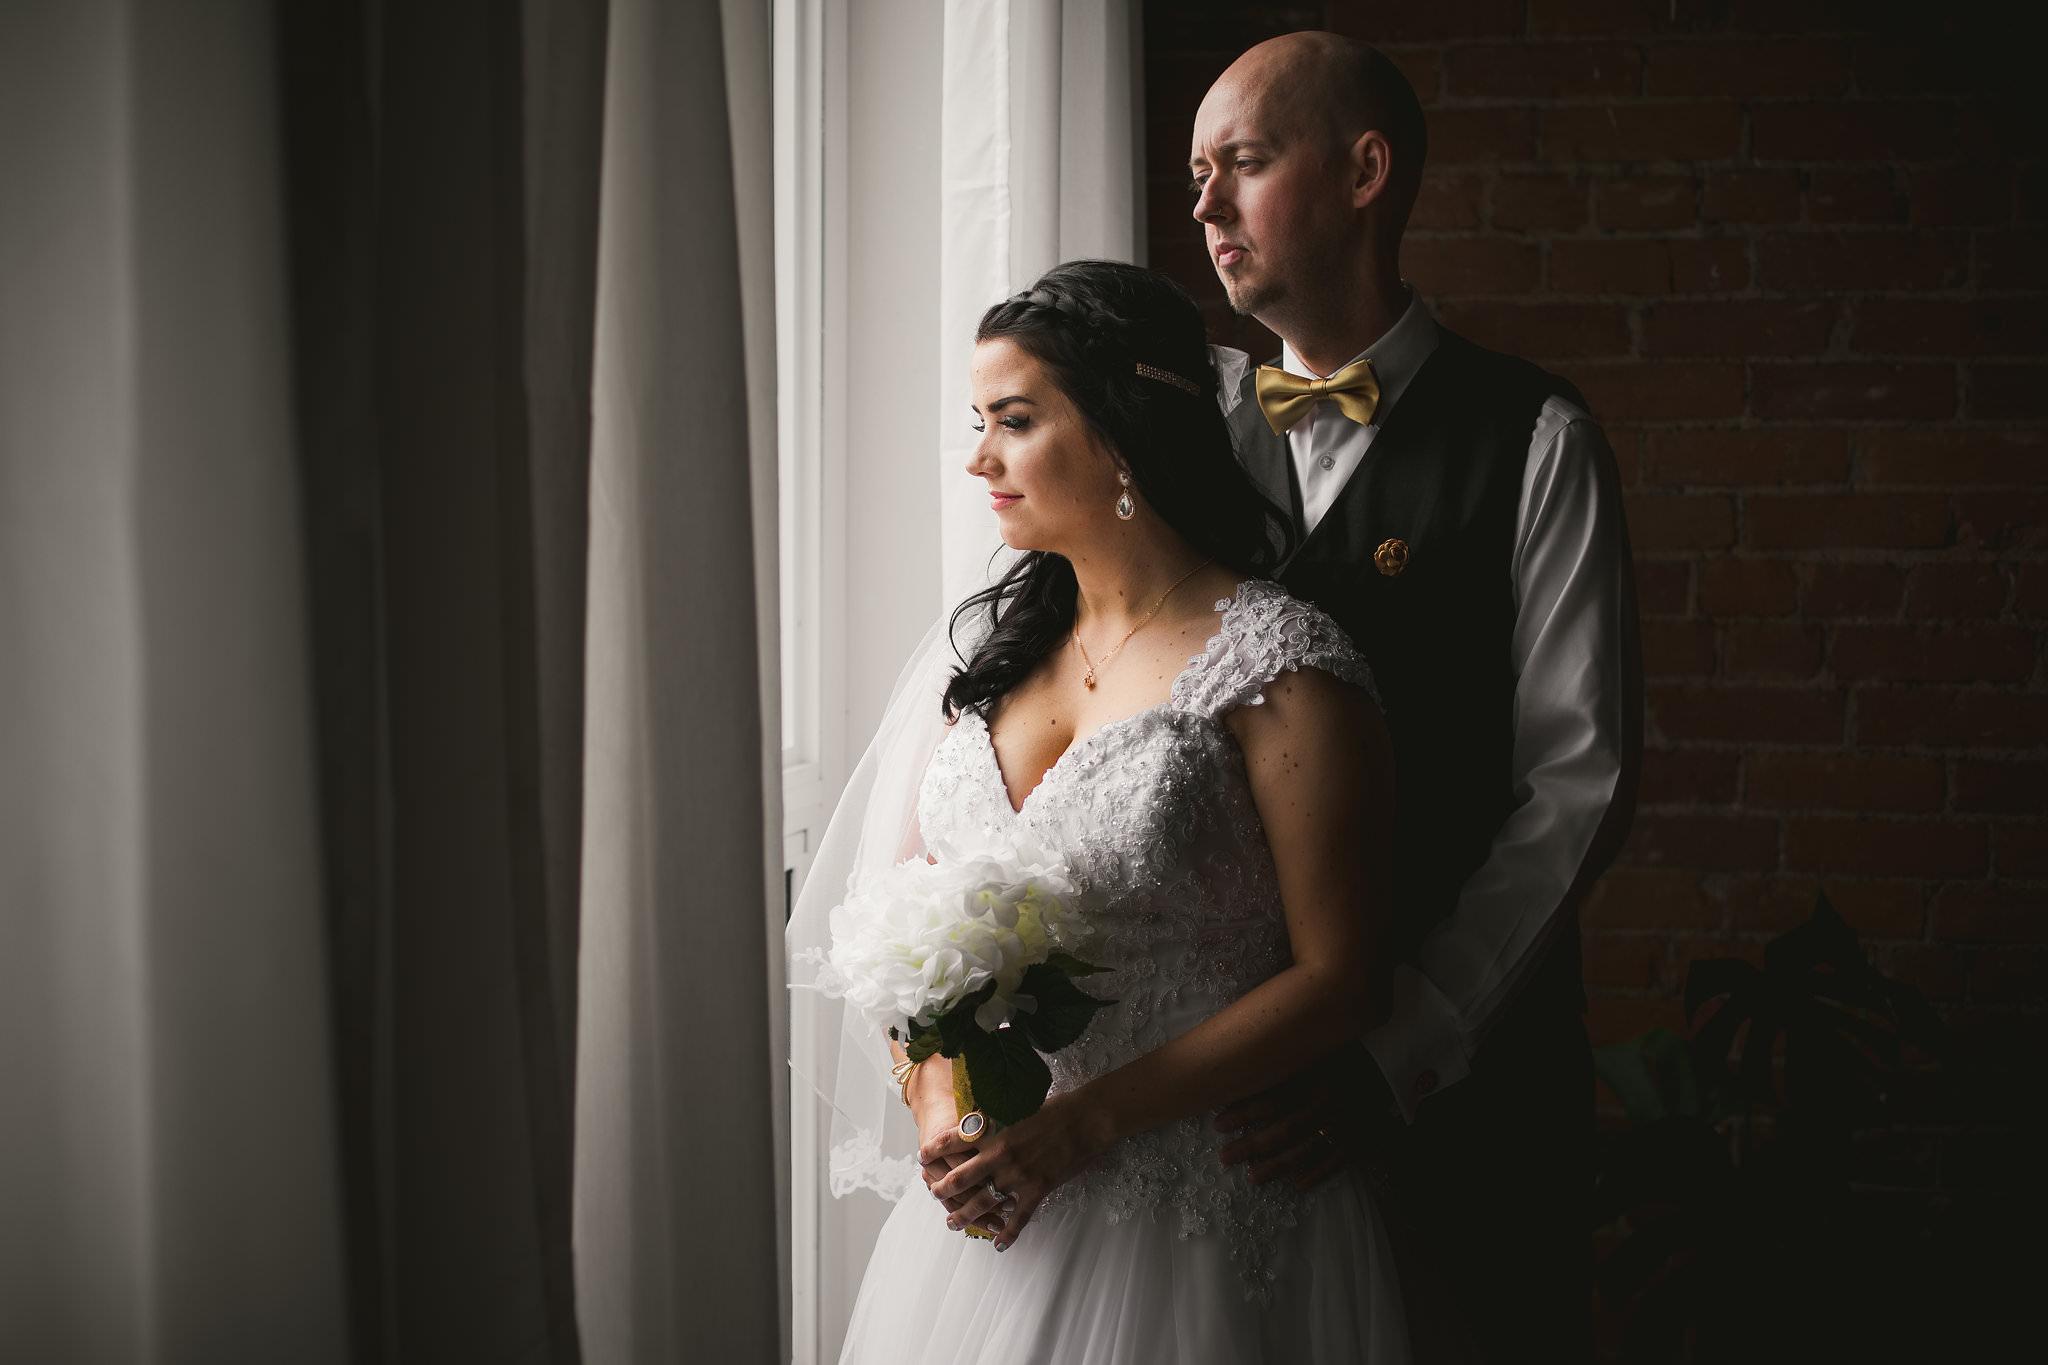 Kristen Adam Kindred Loft Whitby Wedding Photos 296 - Durham Wedding Photographer: Kindred Loft Wedding Photos